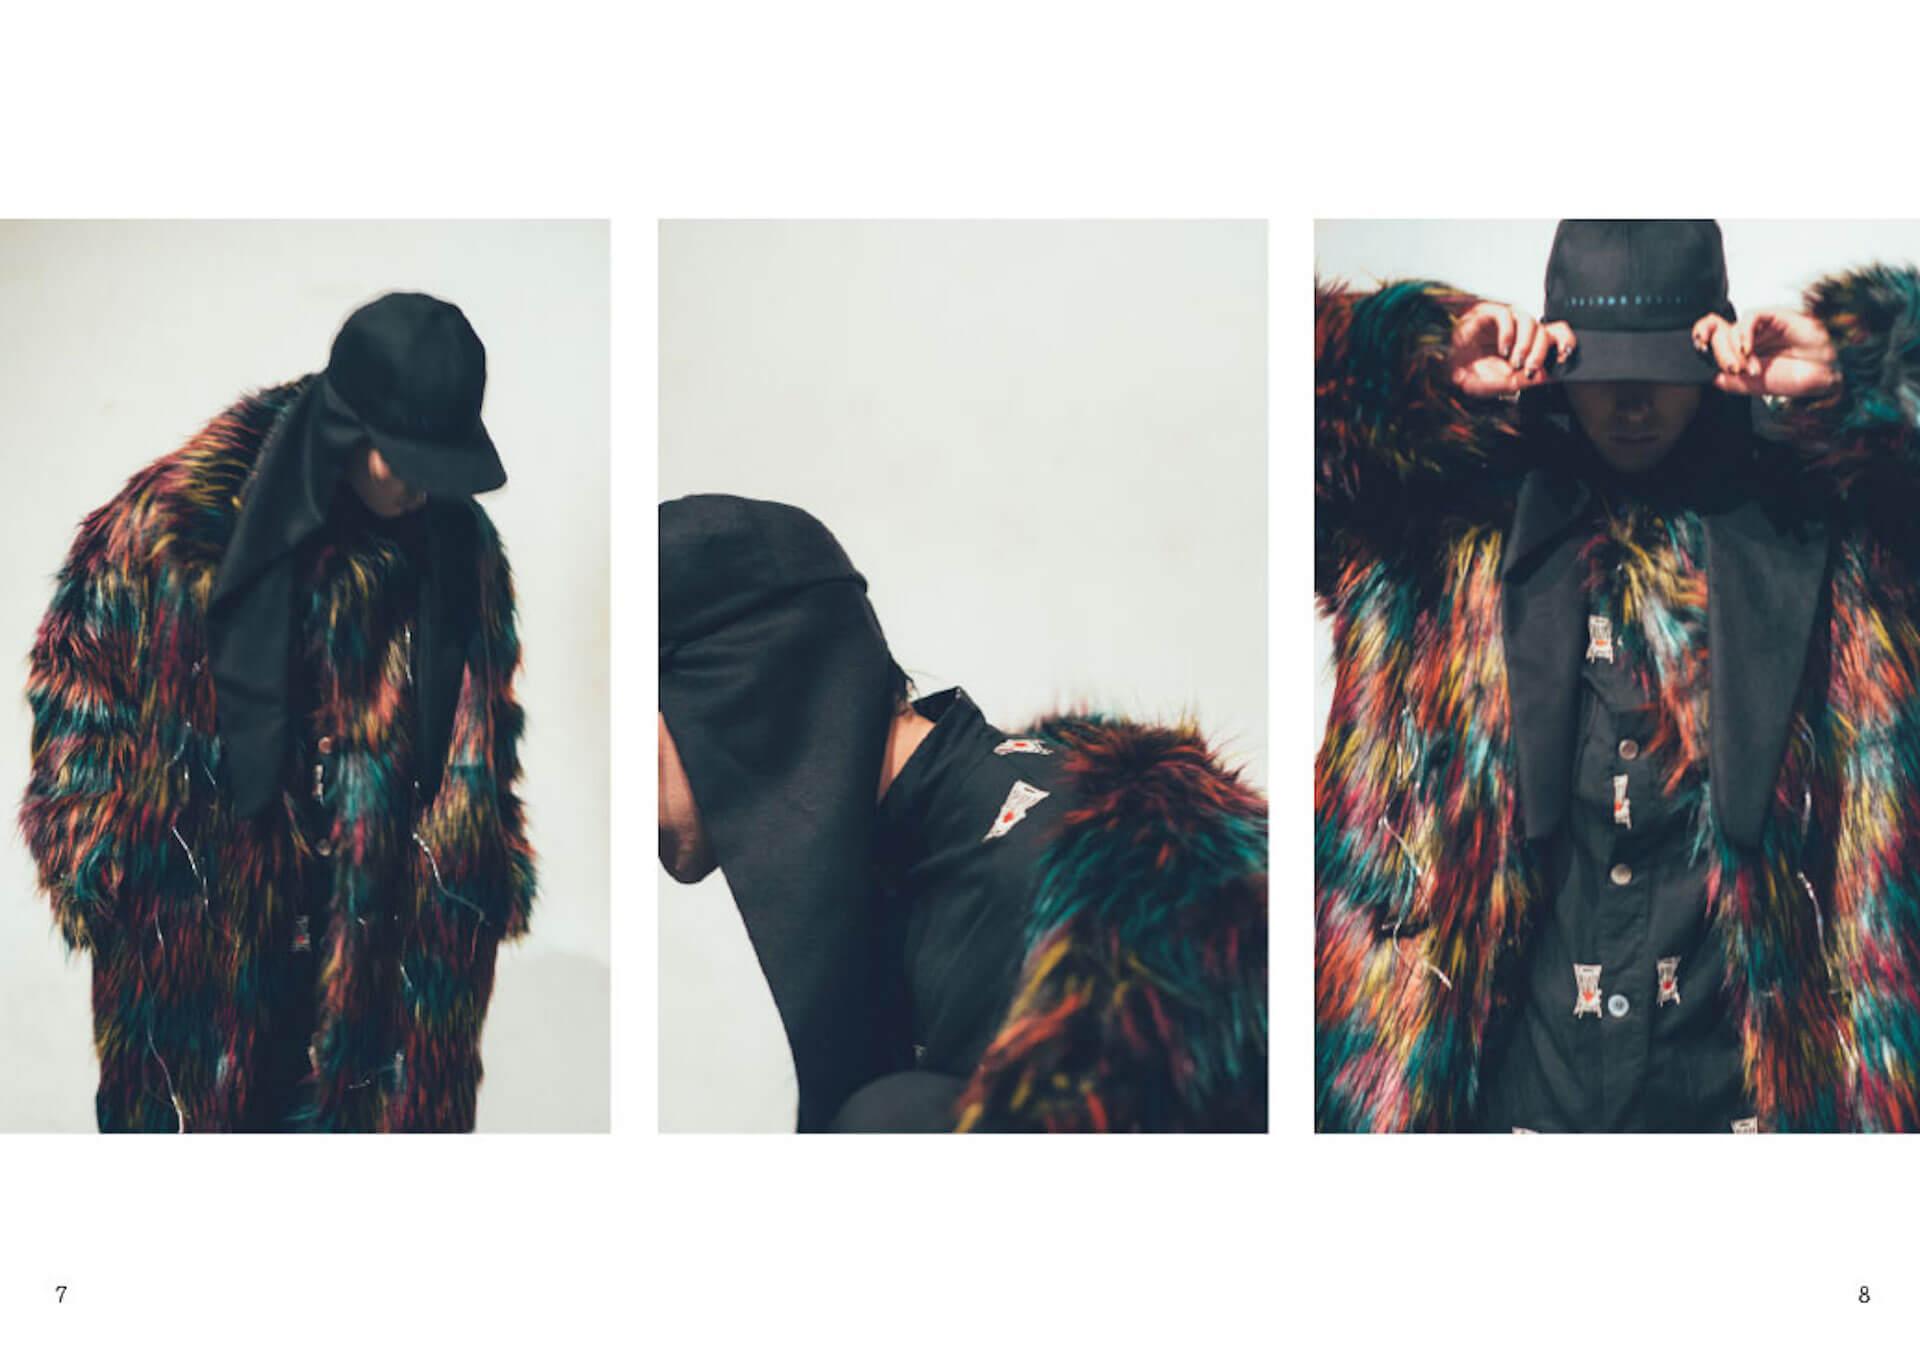 Lehの2020年秋冬コレクションがリリース|イメージモデルに山川冬樹、shimizu mash、elena midoriを起用。コレクションの撮影は水谷太郎。 life_fashion200913-leh-romantic-3